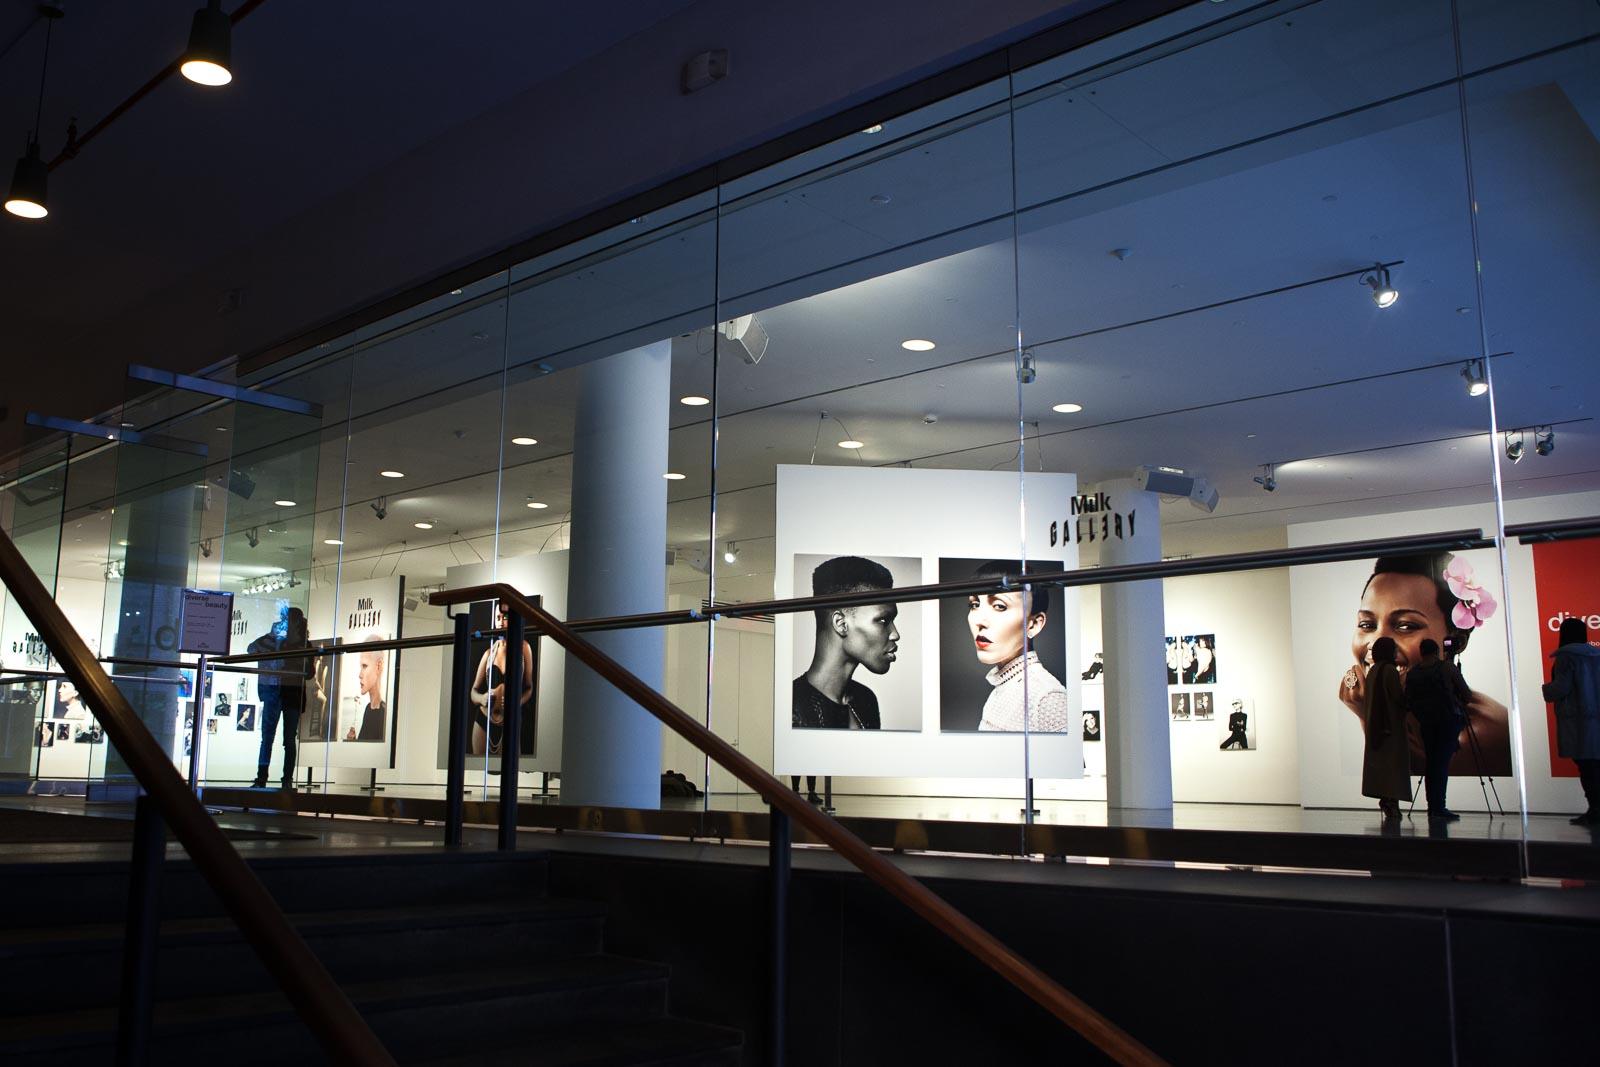 alexi-lubomirski-diverse-beauty-exhibition-robertiaga-4